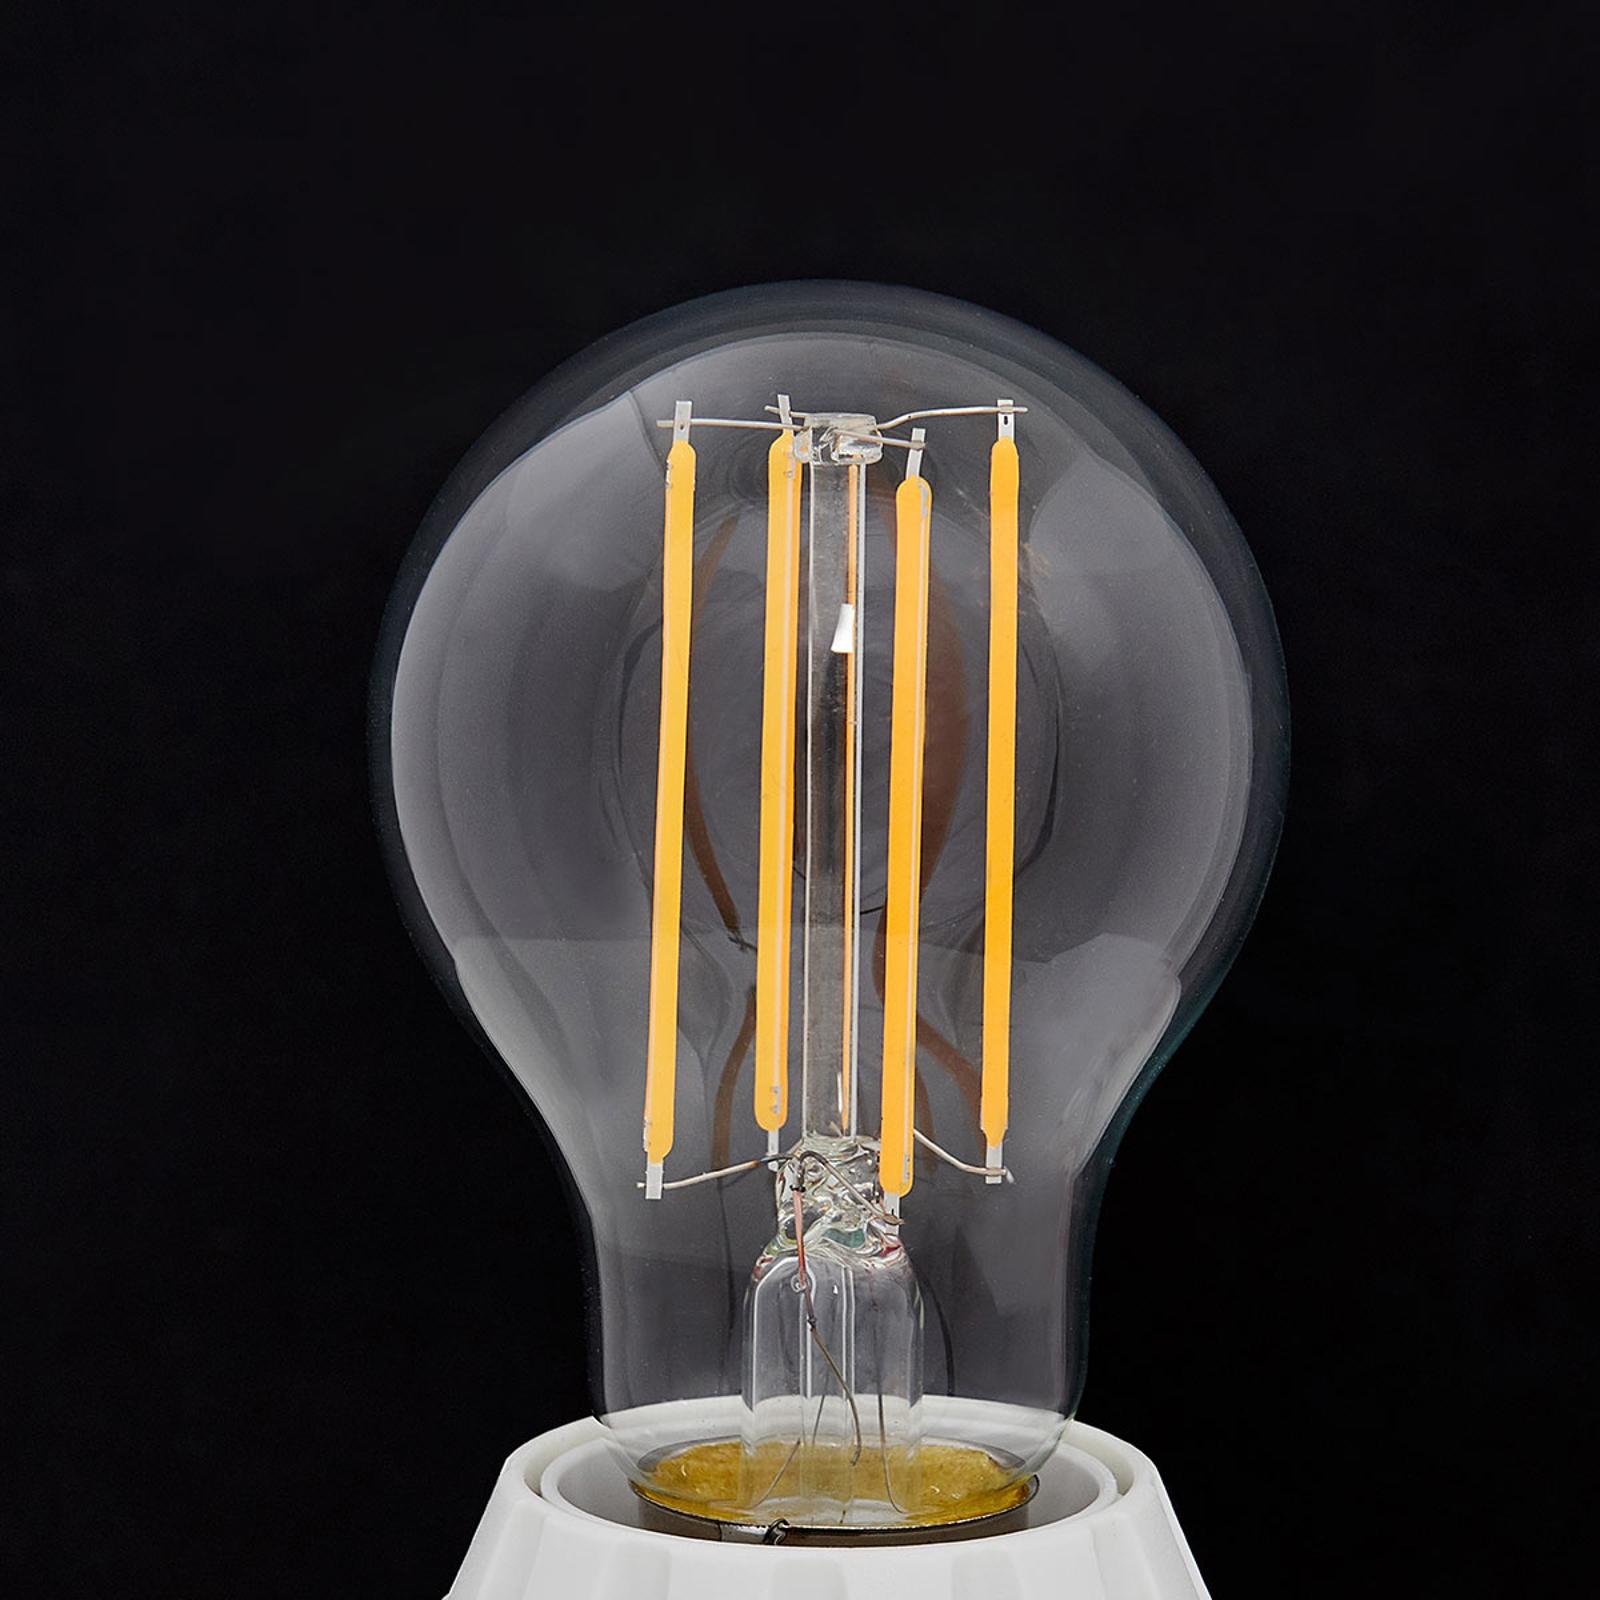 E27 LED-lamp gloeidraad 7W, 806Lm, 2.700K, helder